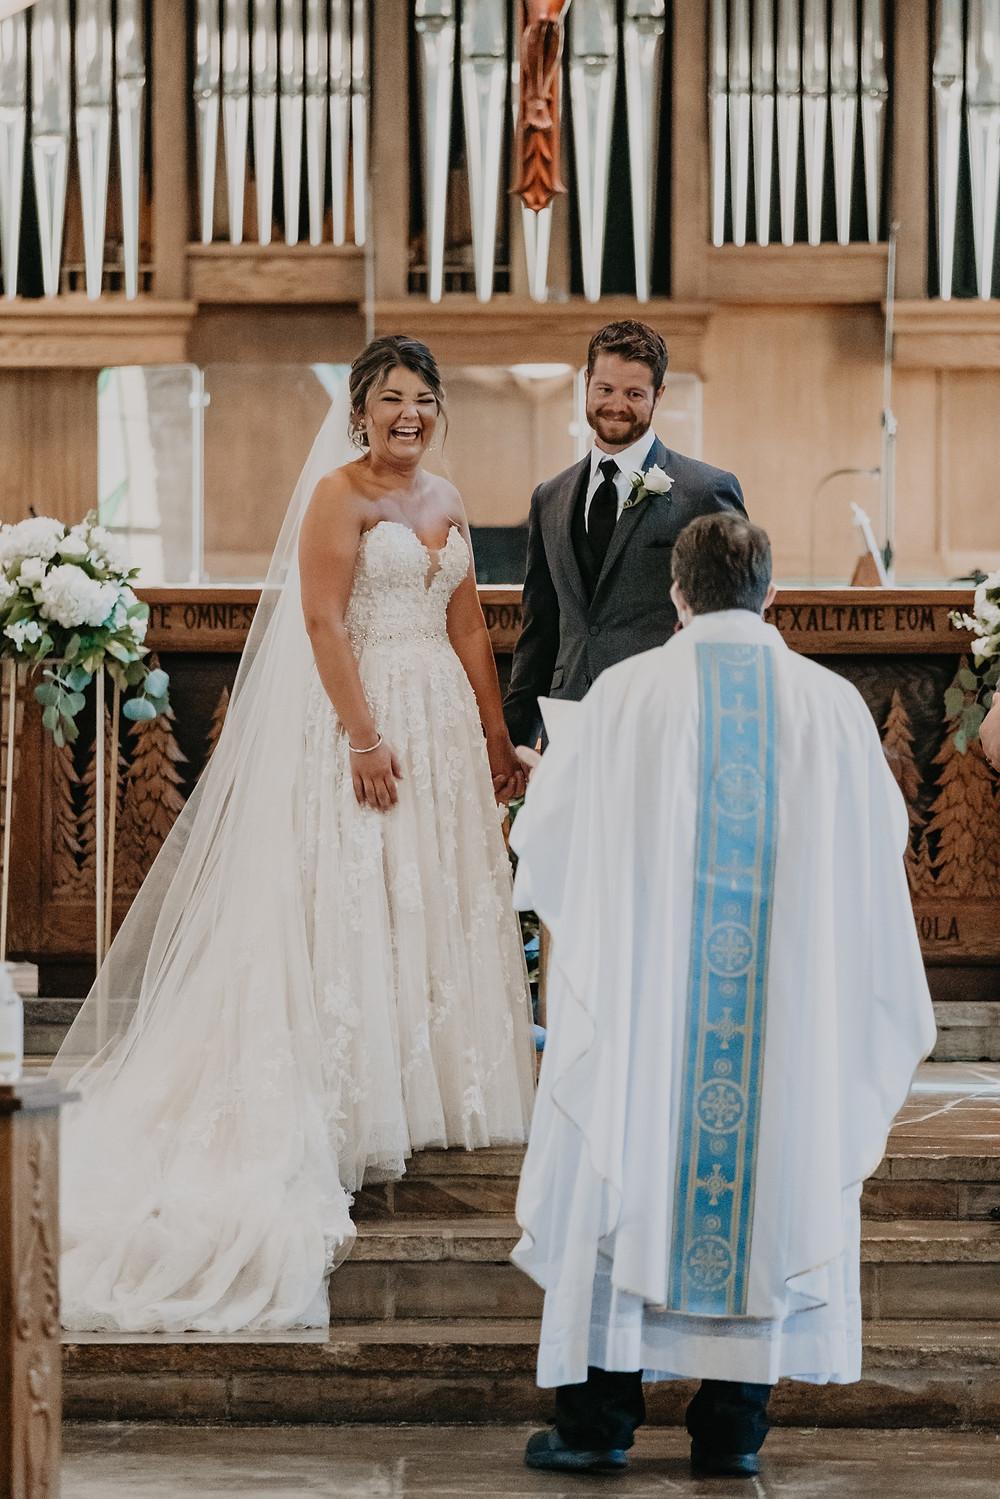 Catholic church wedding ceremony. Photographed by Nicole Leanne Photography.